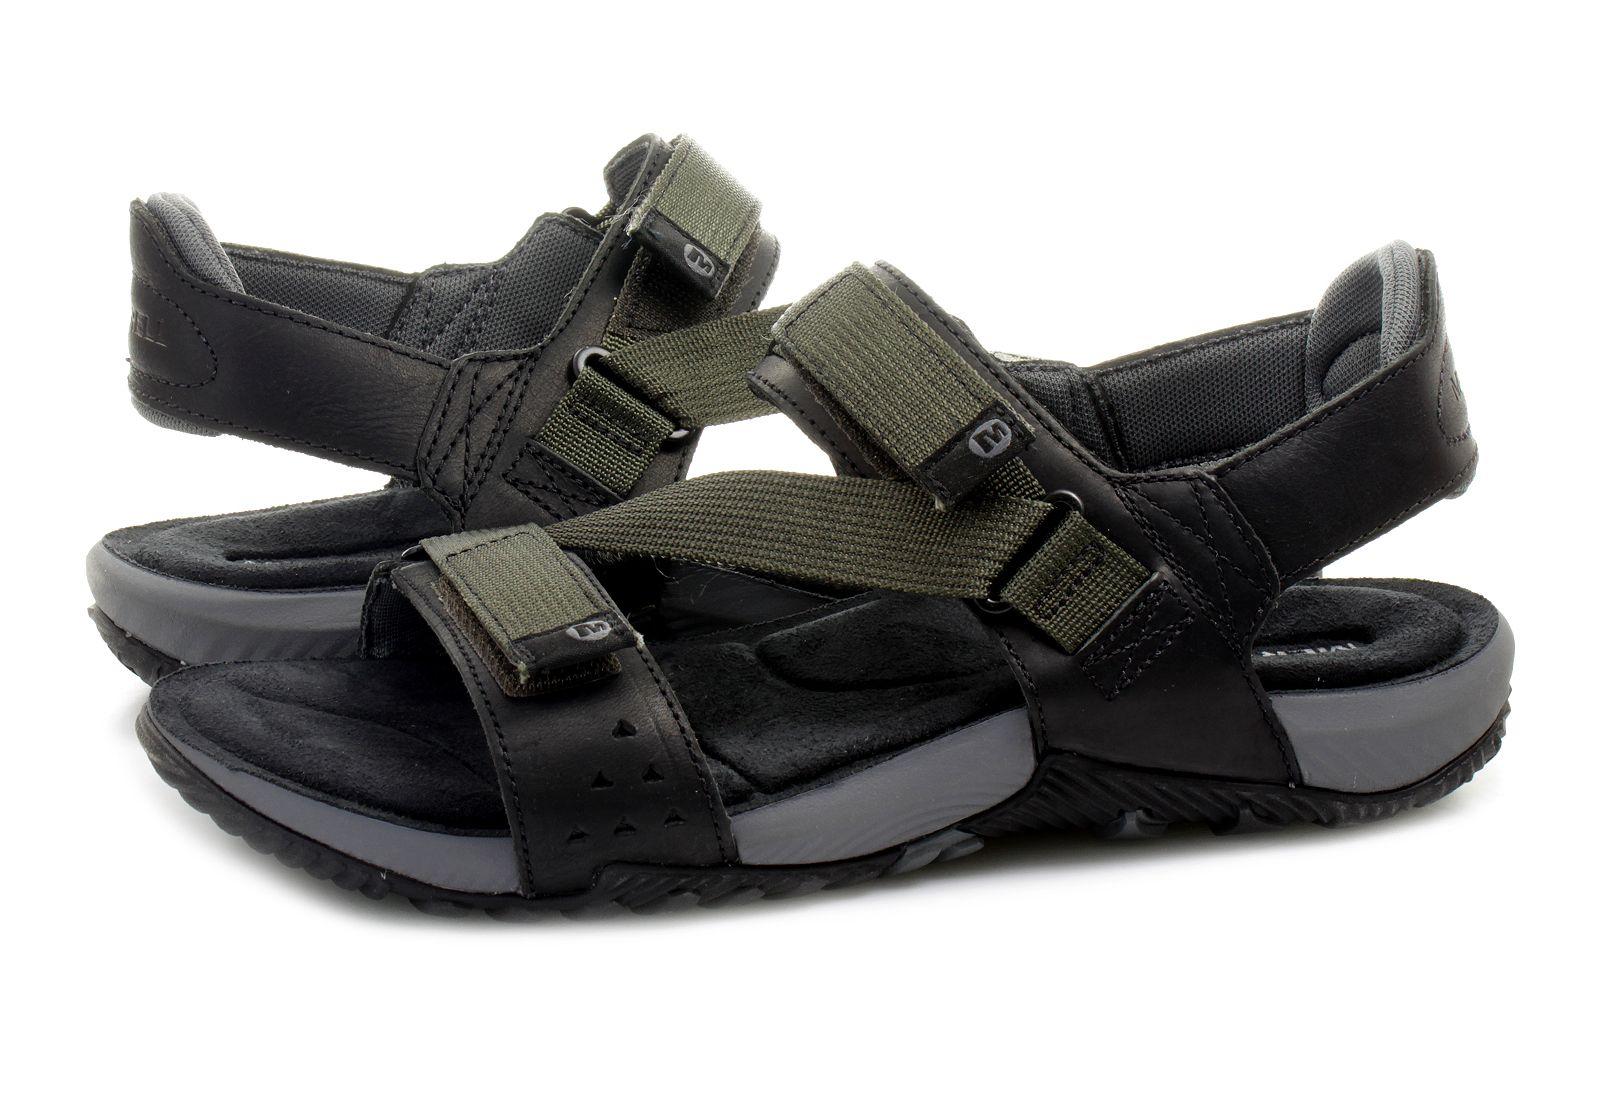 Black merrell sandals - Merrell Sandals Terrant Strap